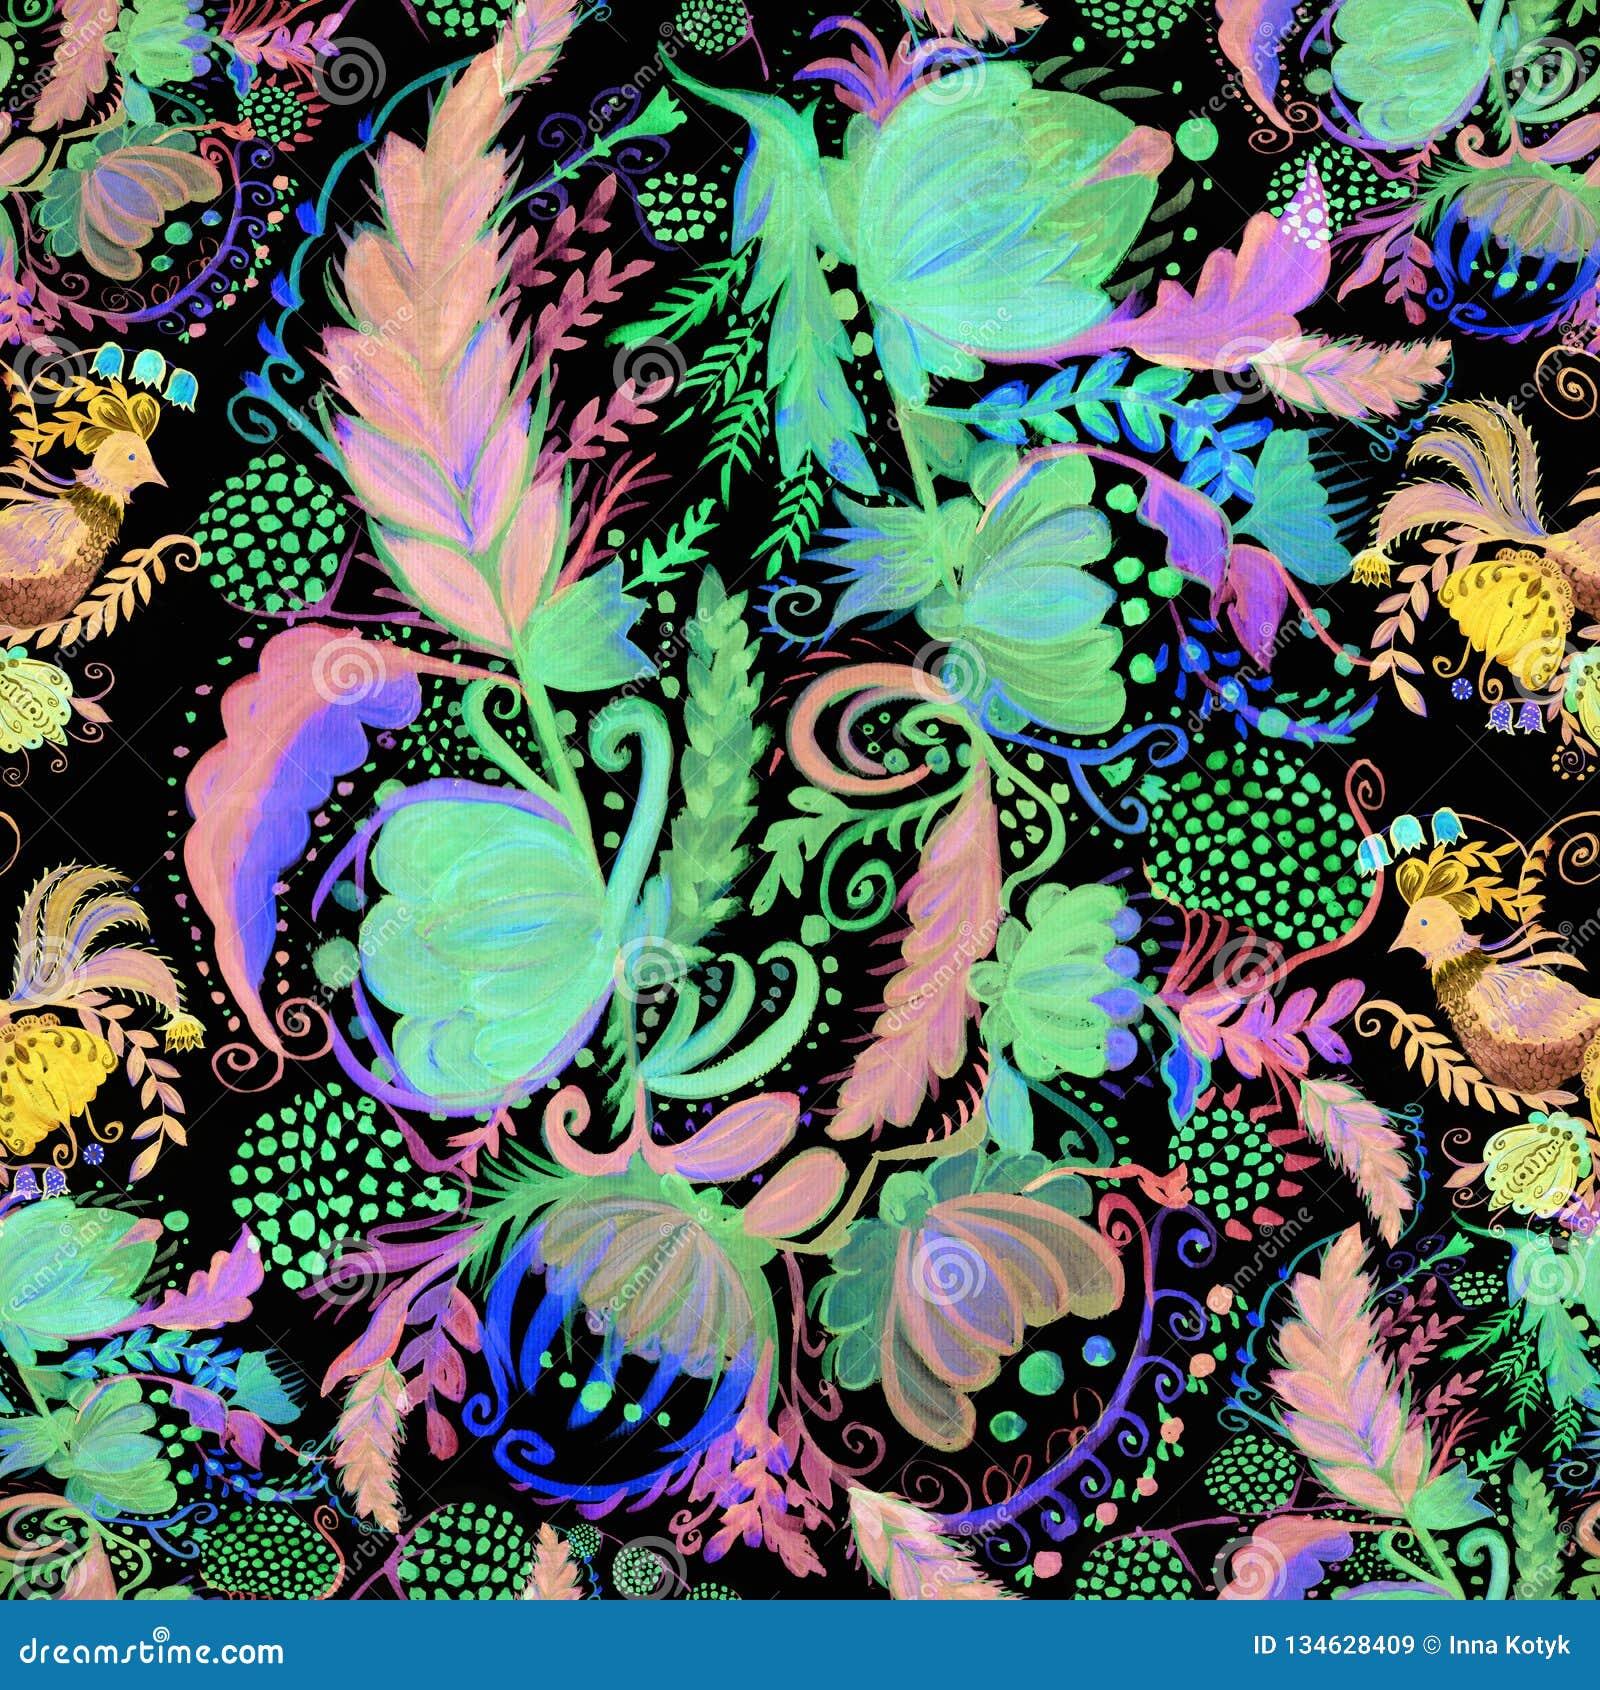 Ukrainian ethnic painting. Petrikovskaya painting. Flower composition. Stylized flowers.Seamless background. Use printed materials